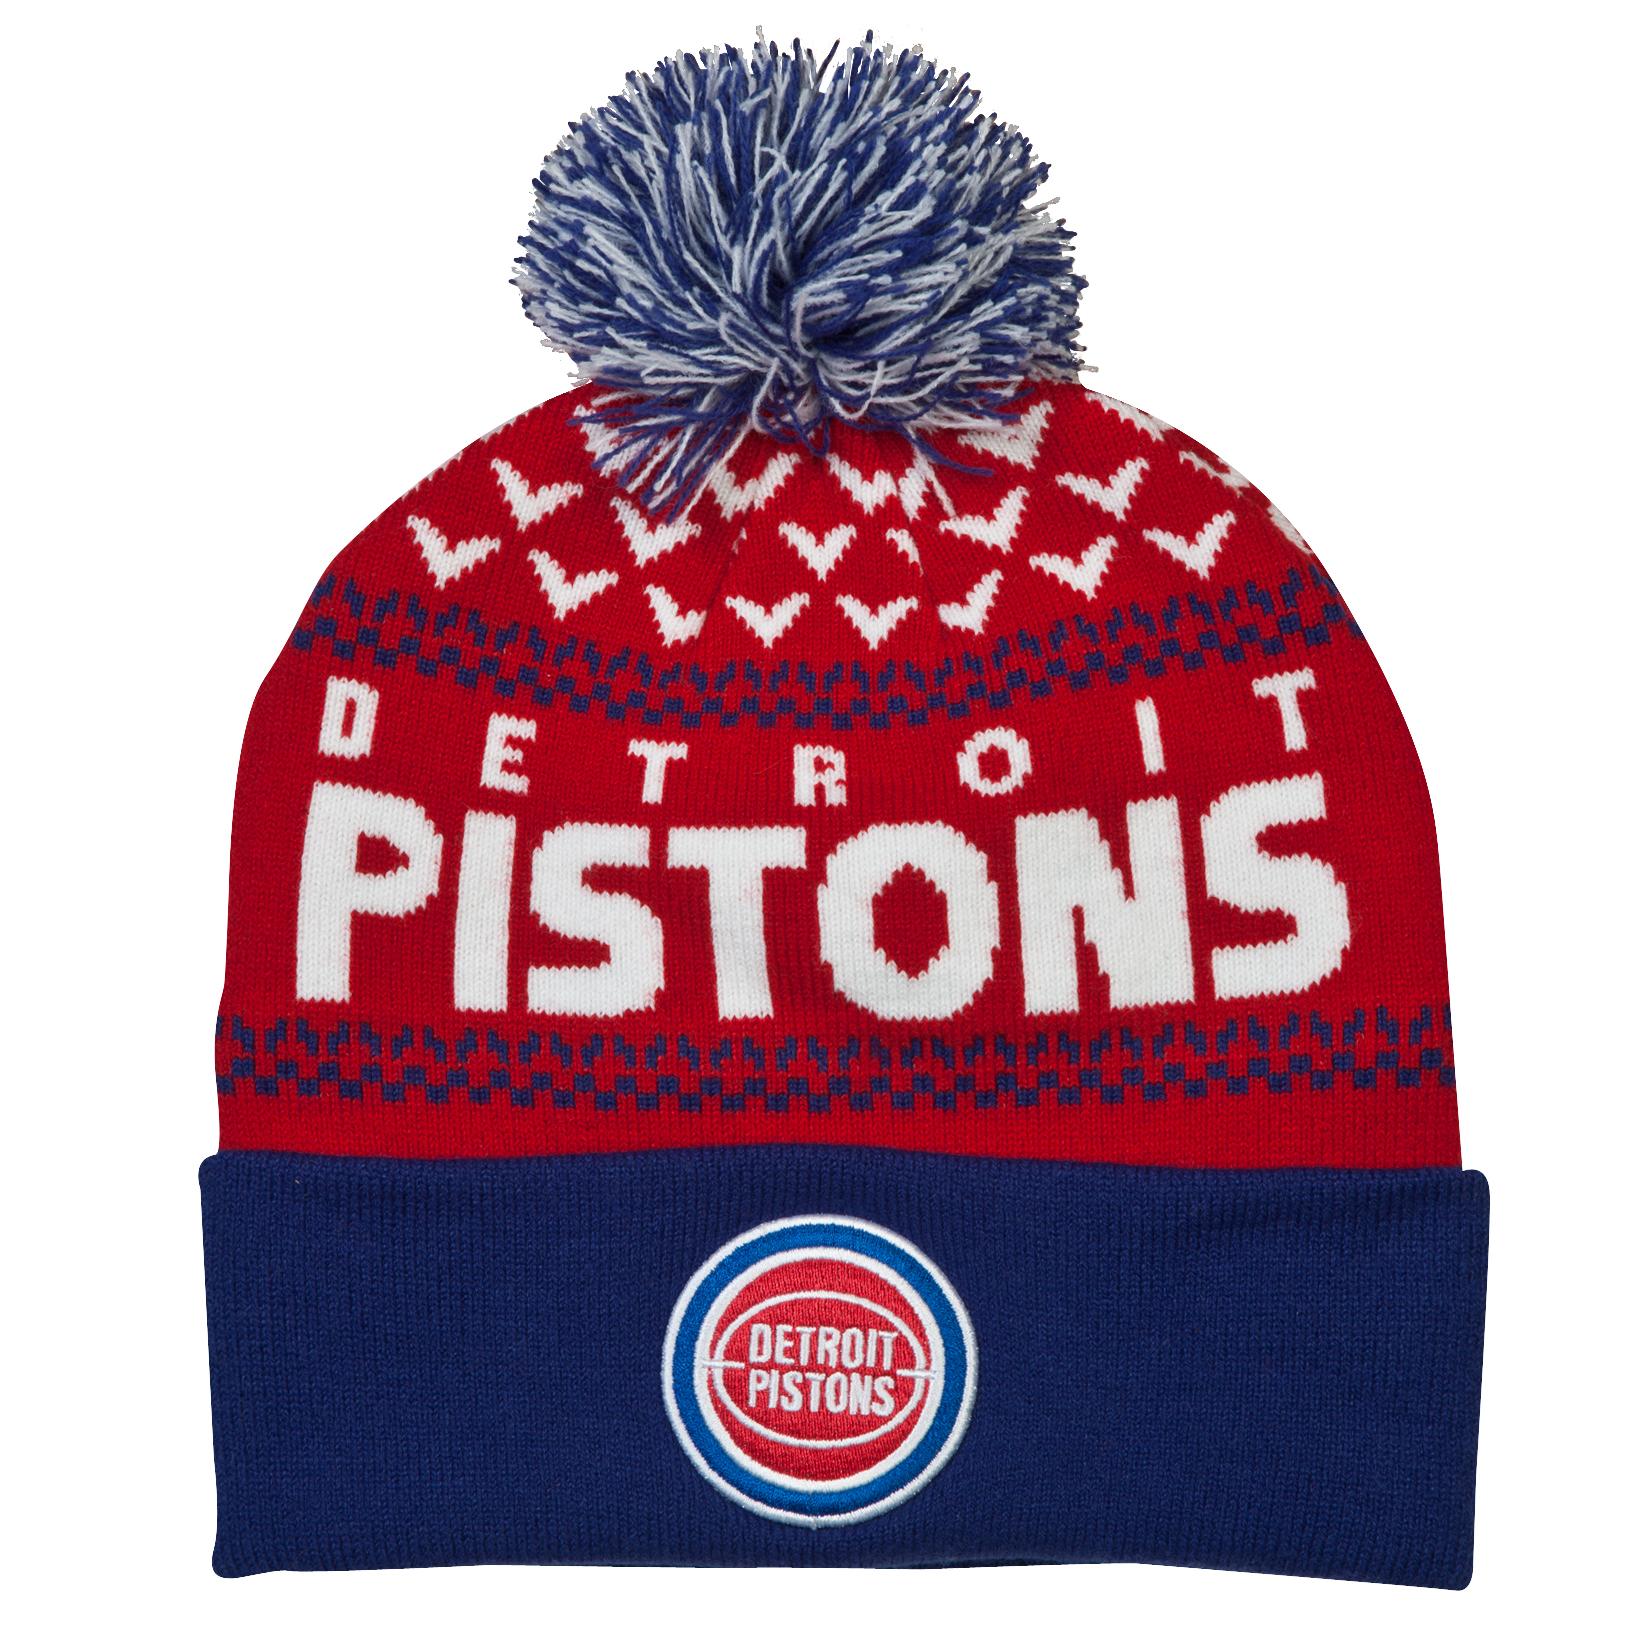 Detroit Pistons Nujacq Cuff Knit Bobble Hat Red